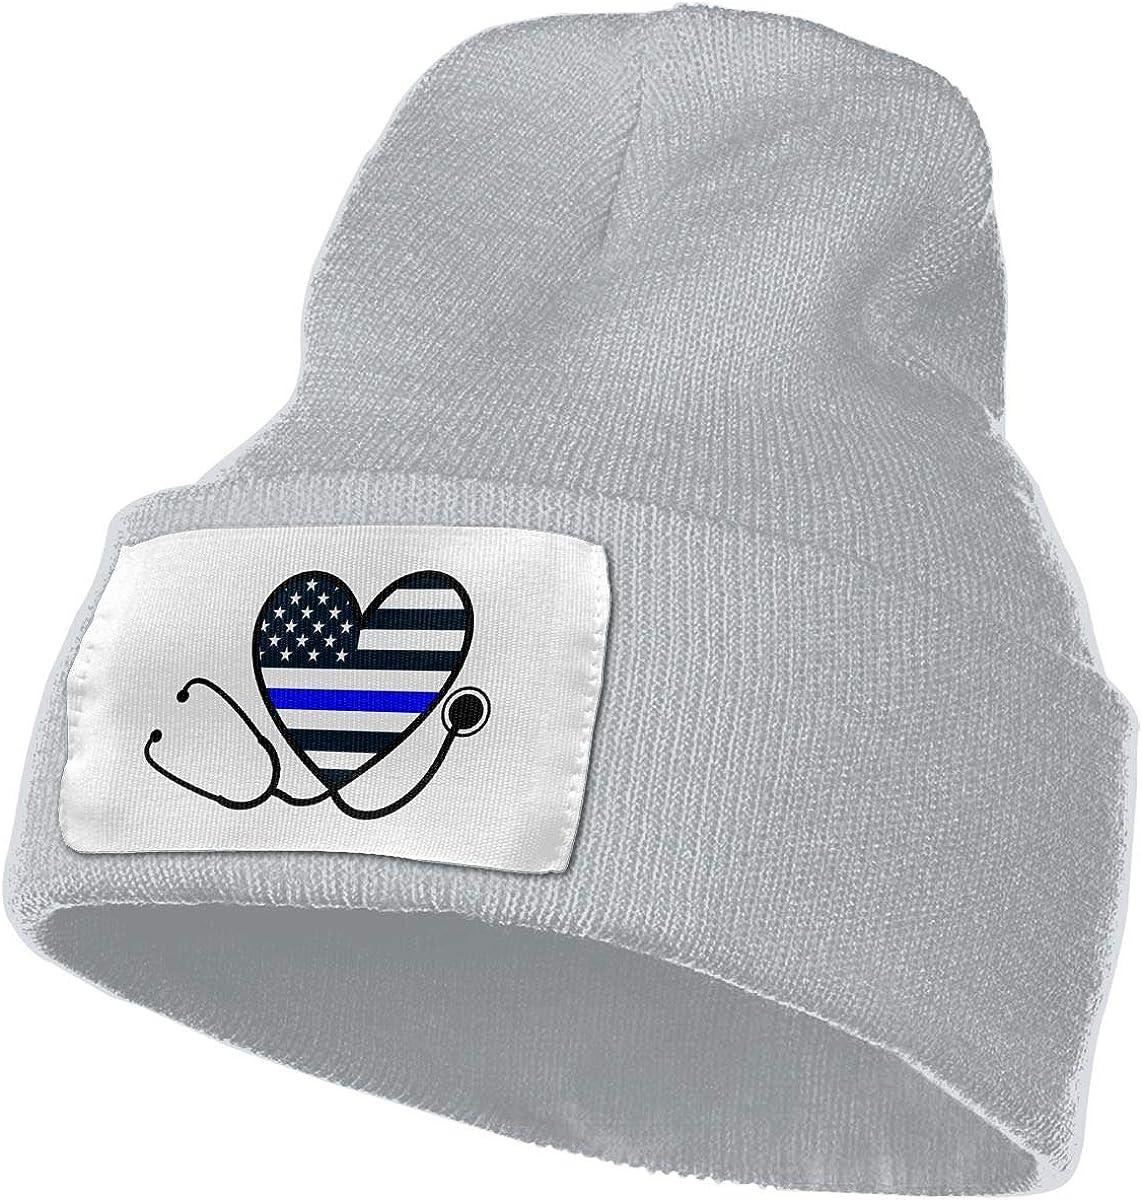 Unisex Winter Hats Thin Blue Line Nurse Stethoscope Nurses Skull Caps Knit Hat Cap Beanie Cap for Men//Womens